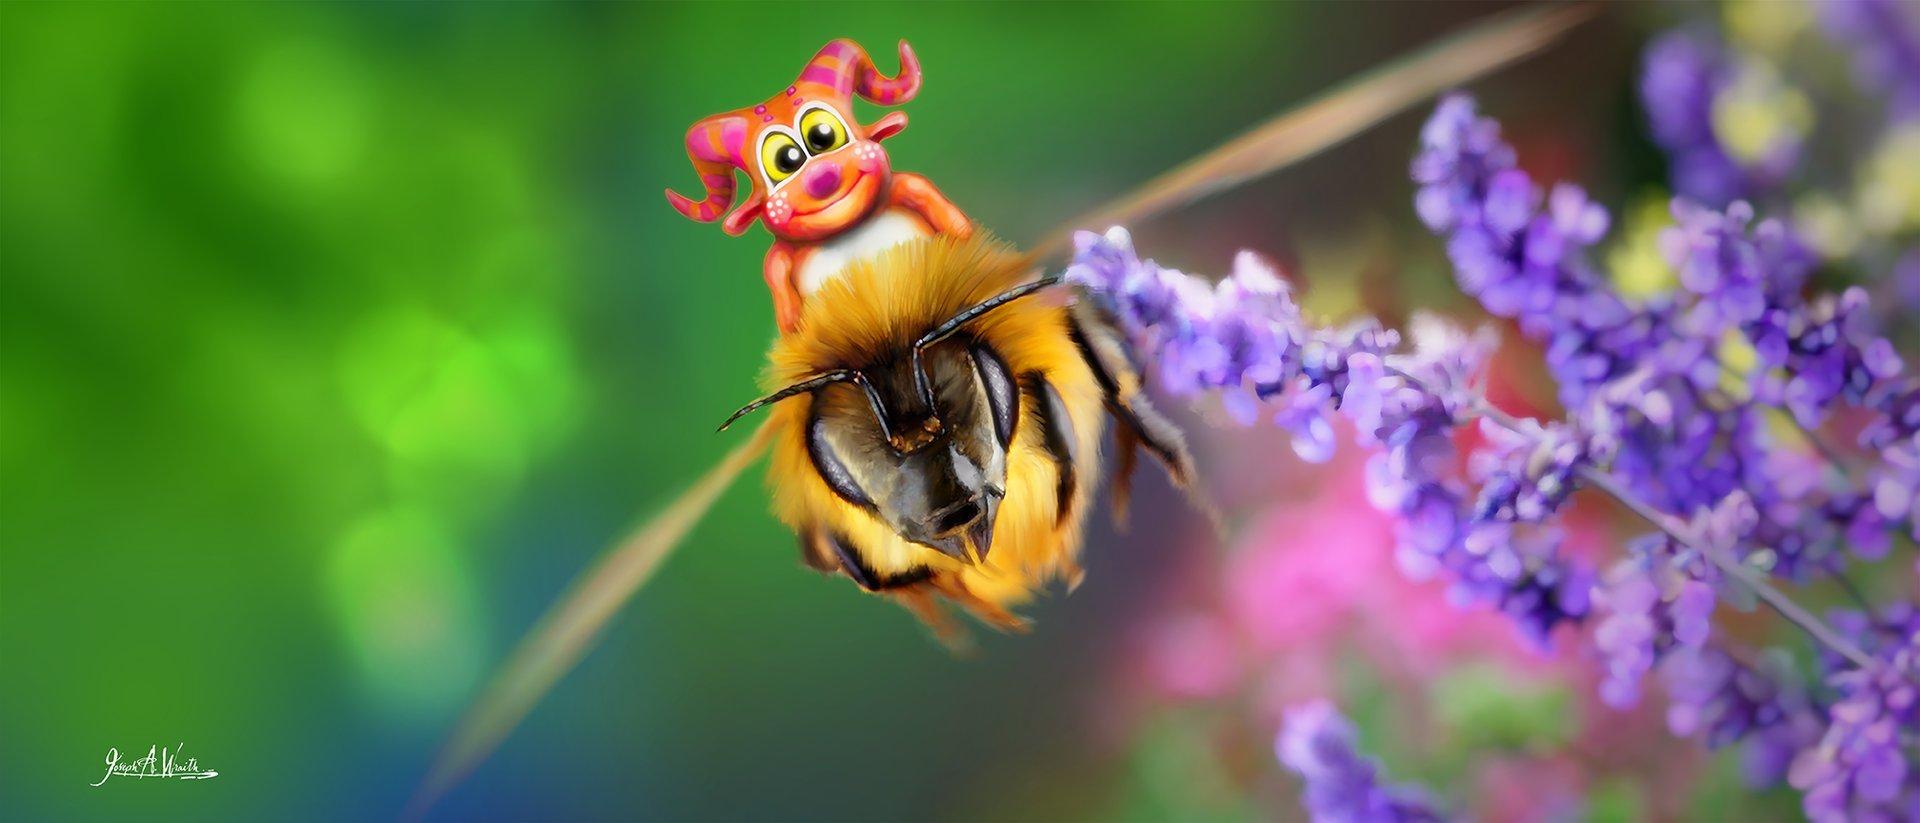 Joseph wraith telior rides a bee med